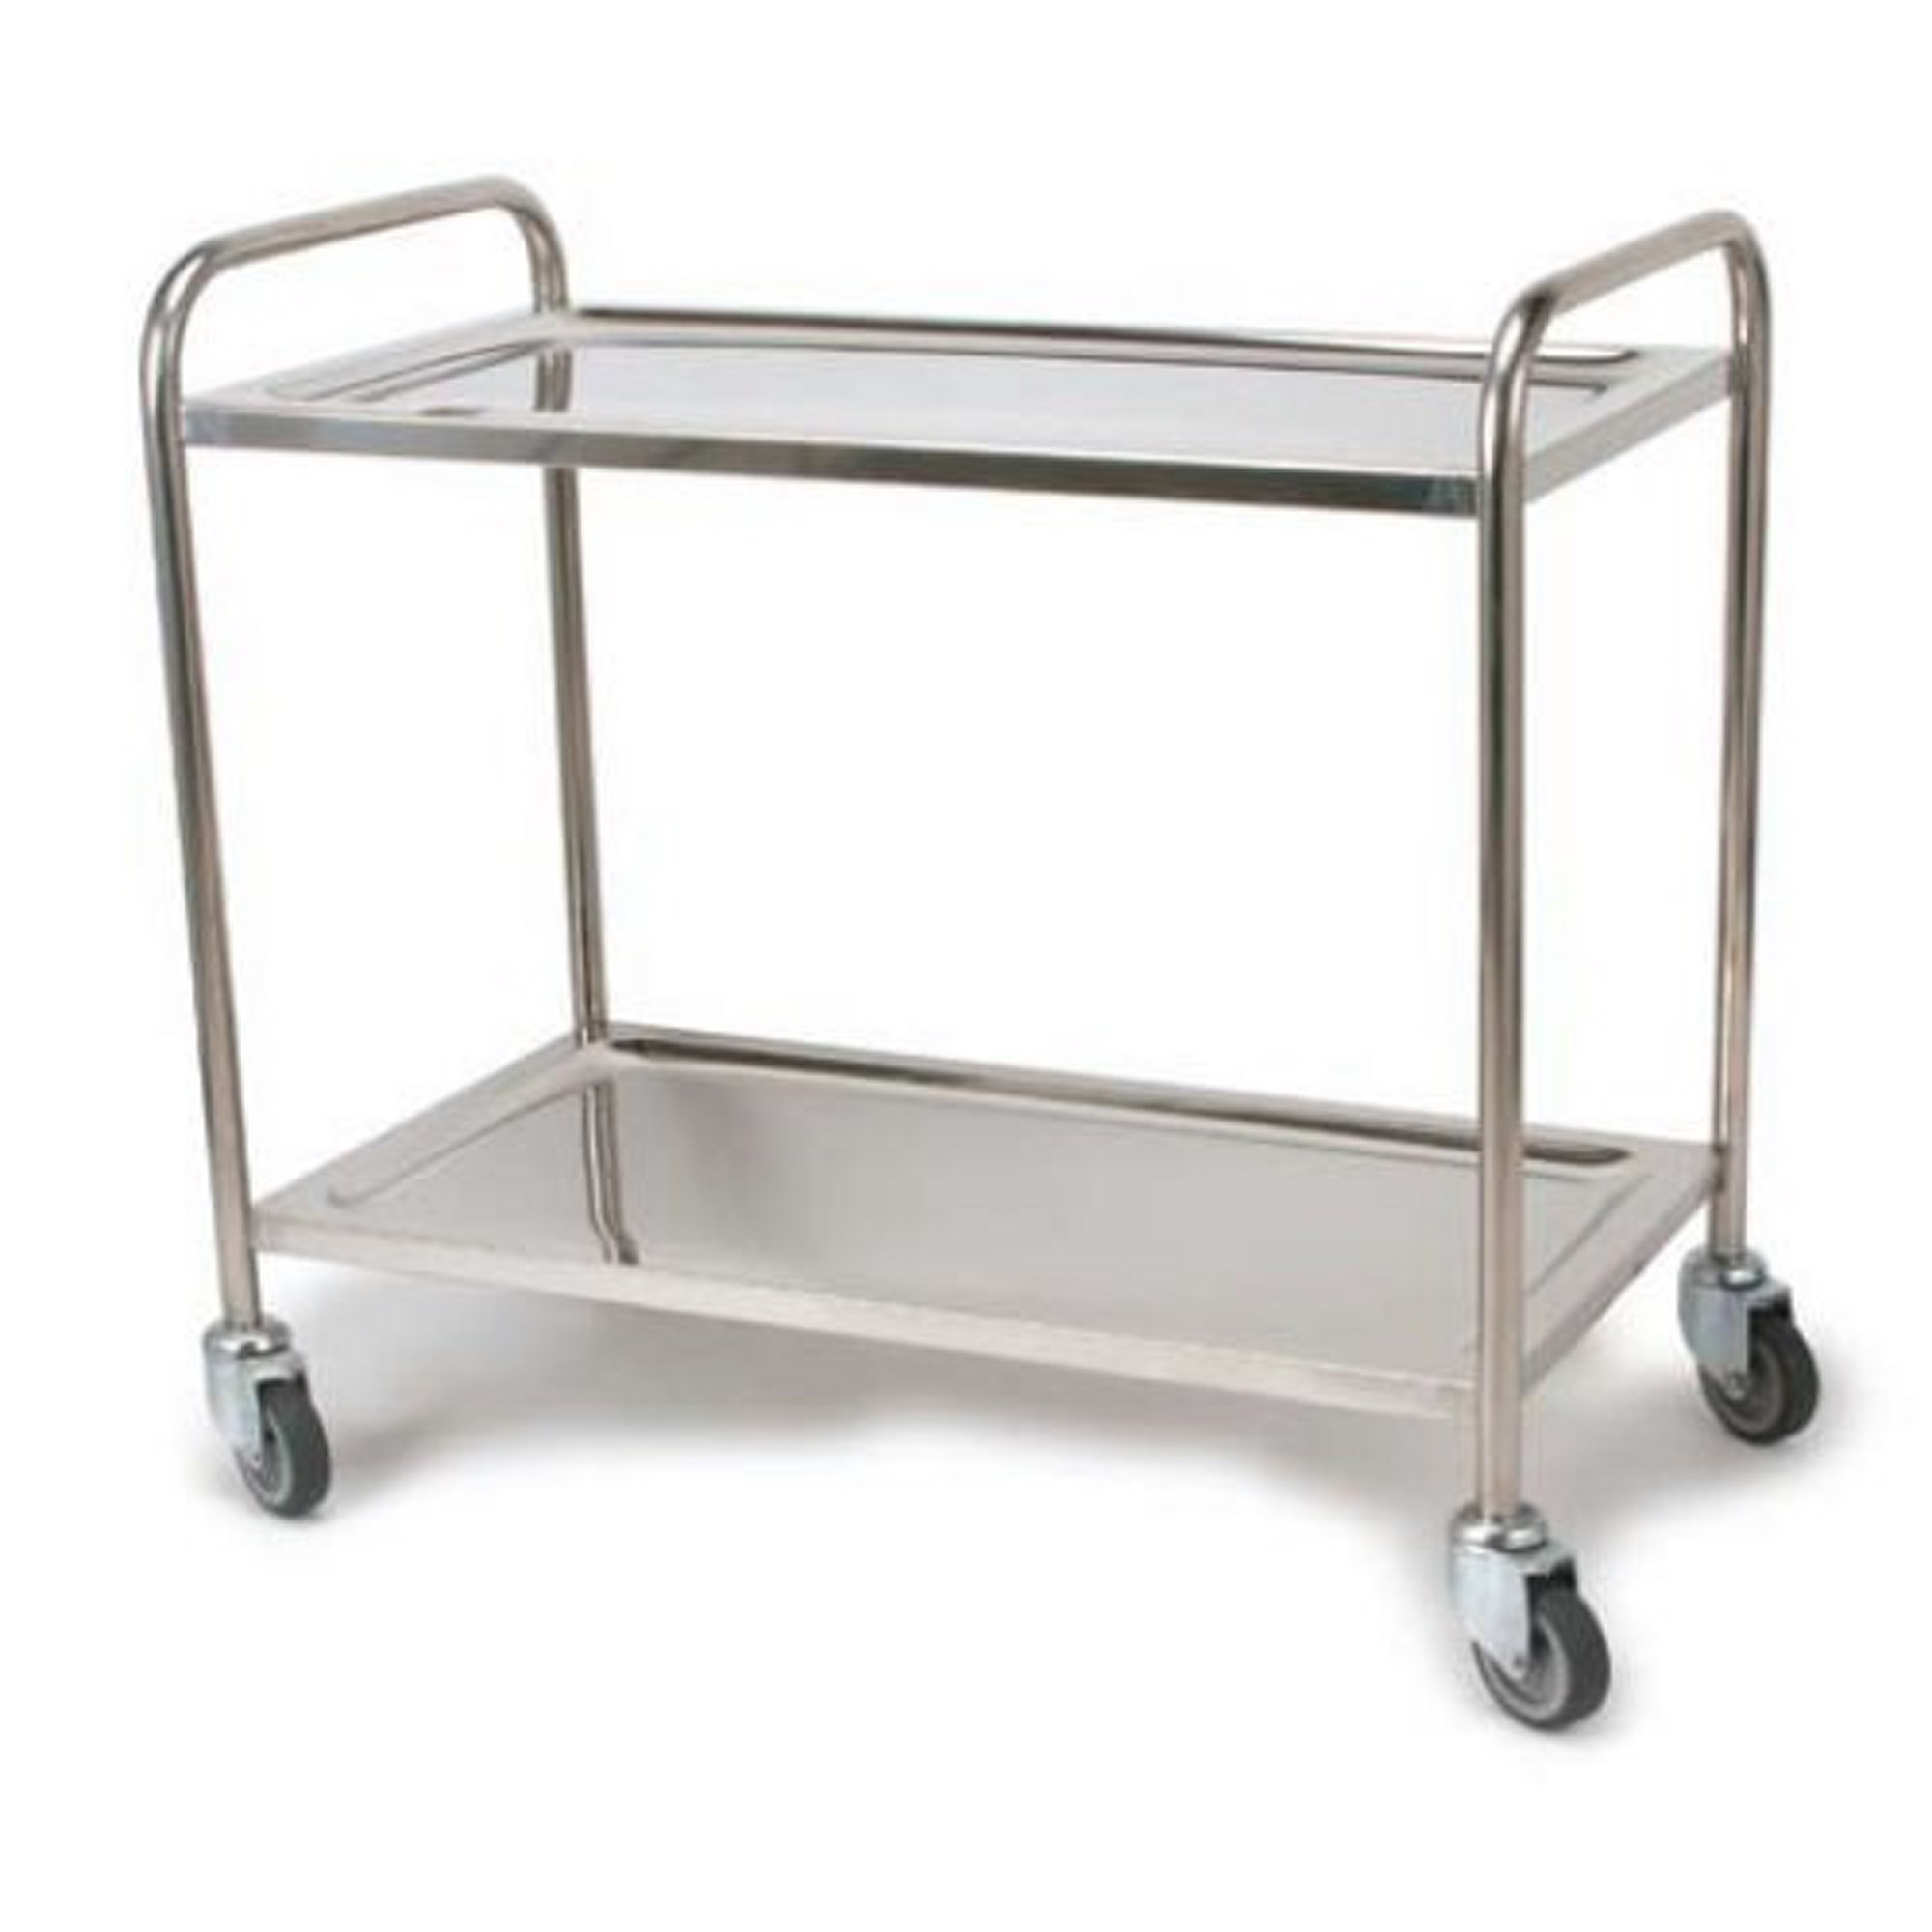 Stainless Steel Trolleys 2 Tier